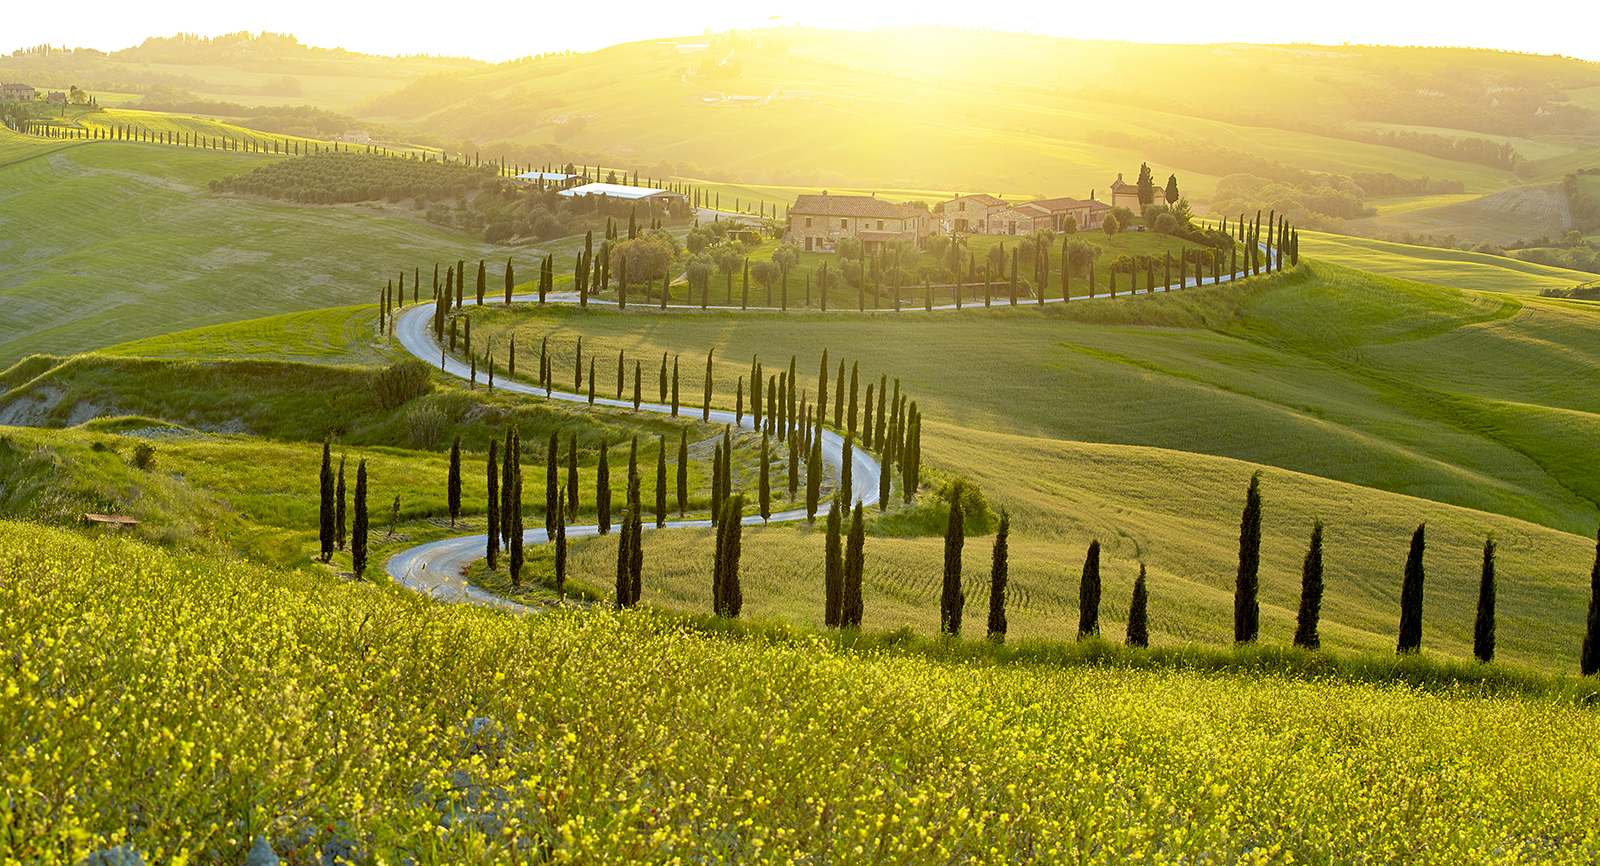 spiritual-landscape-beautiful-green-peaceful-freedom-light-green